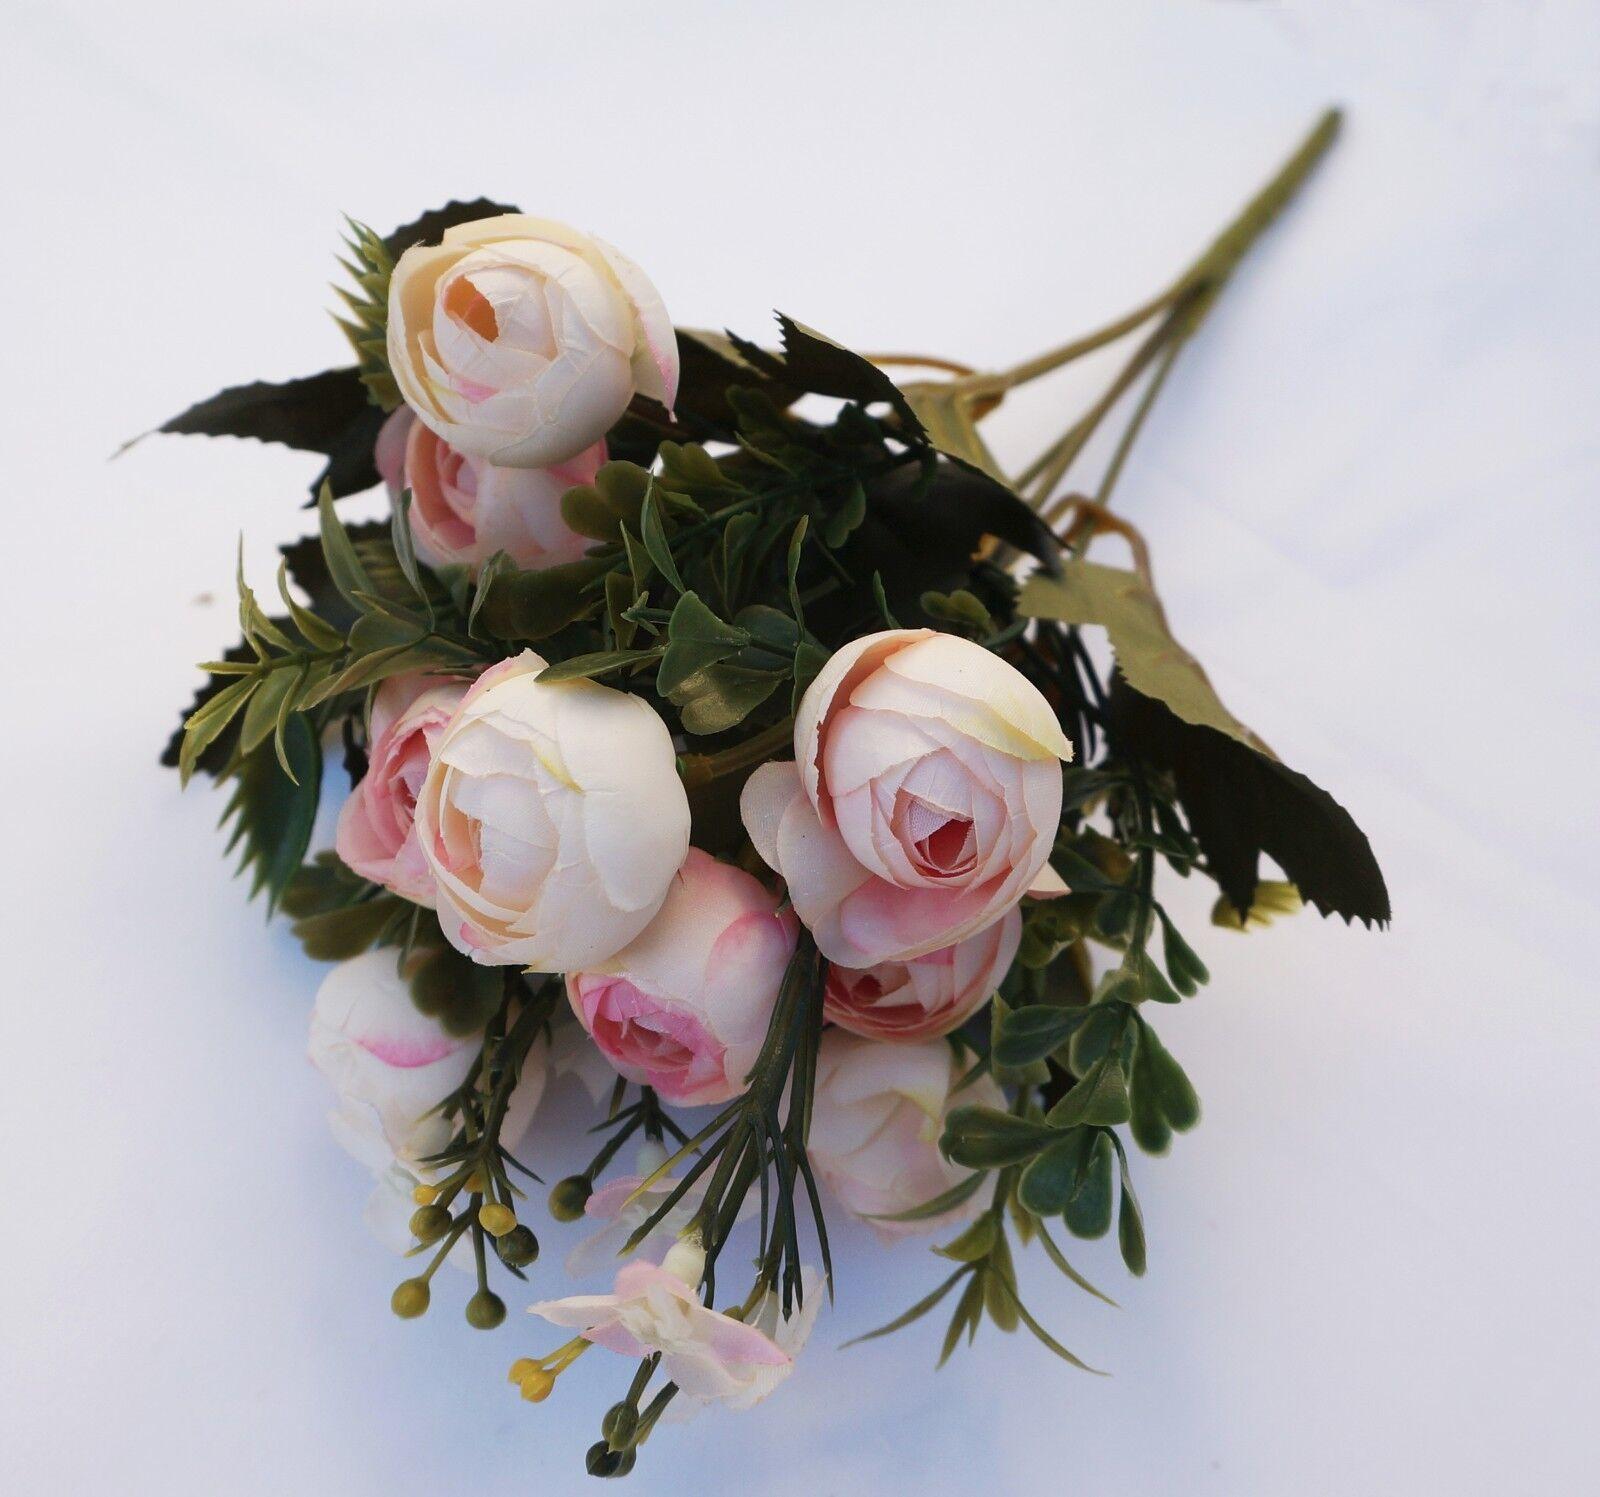 Shans silk flower artificial home wedding decor bridal bouquet 4 picture 2 of 4 izmirmasajfo